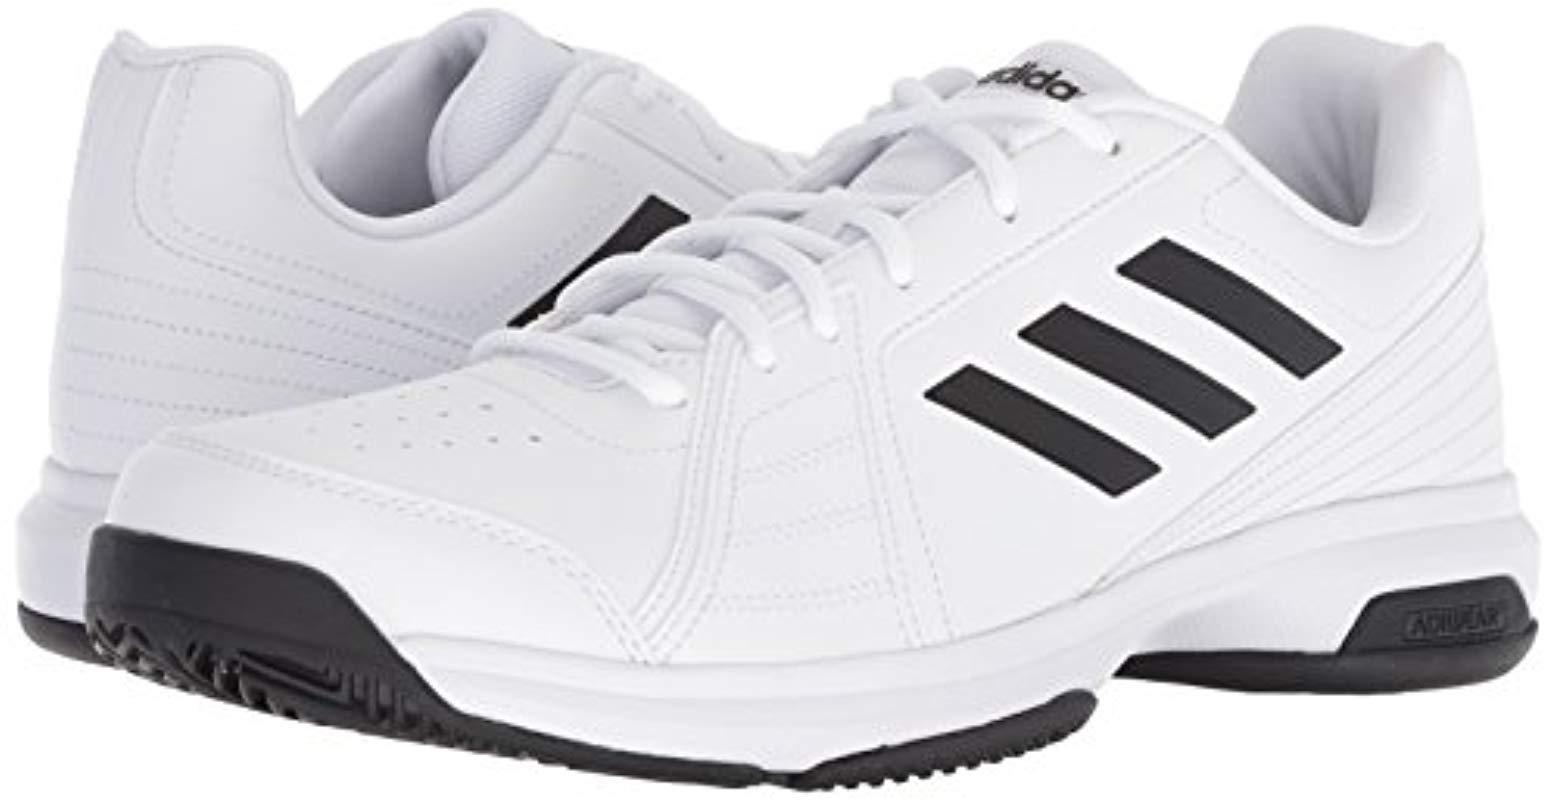 Approach Tennis Shoe